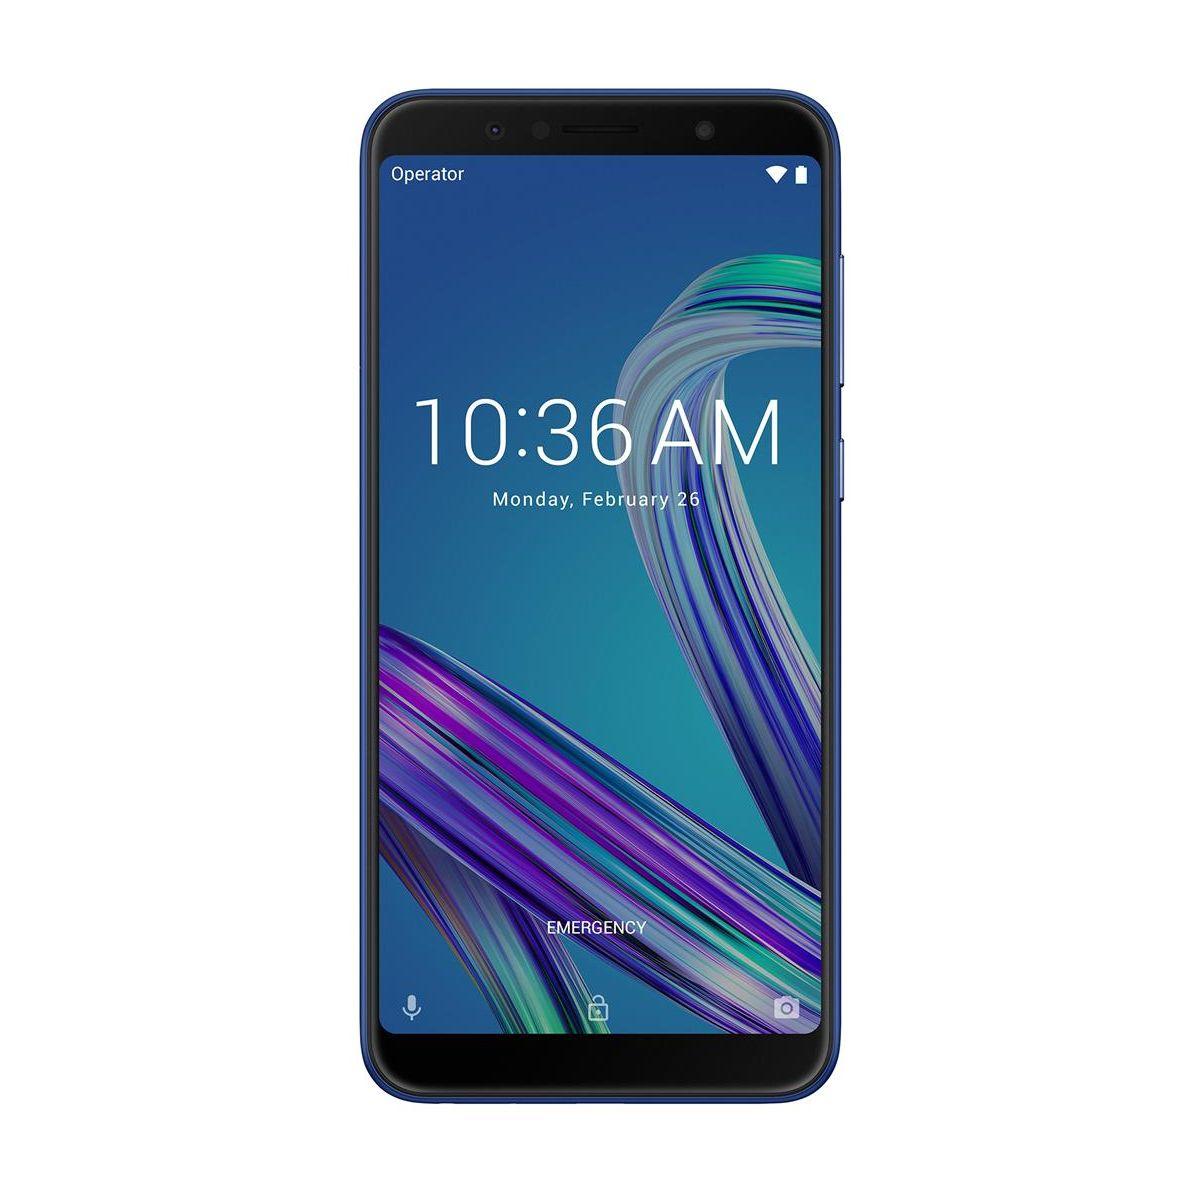 Smartphone ASUS Zenfone Max Pro M1 32 Go Space Blue